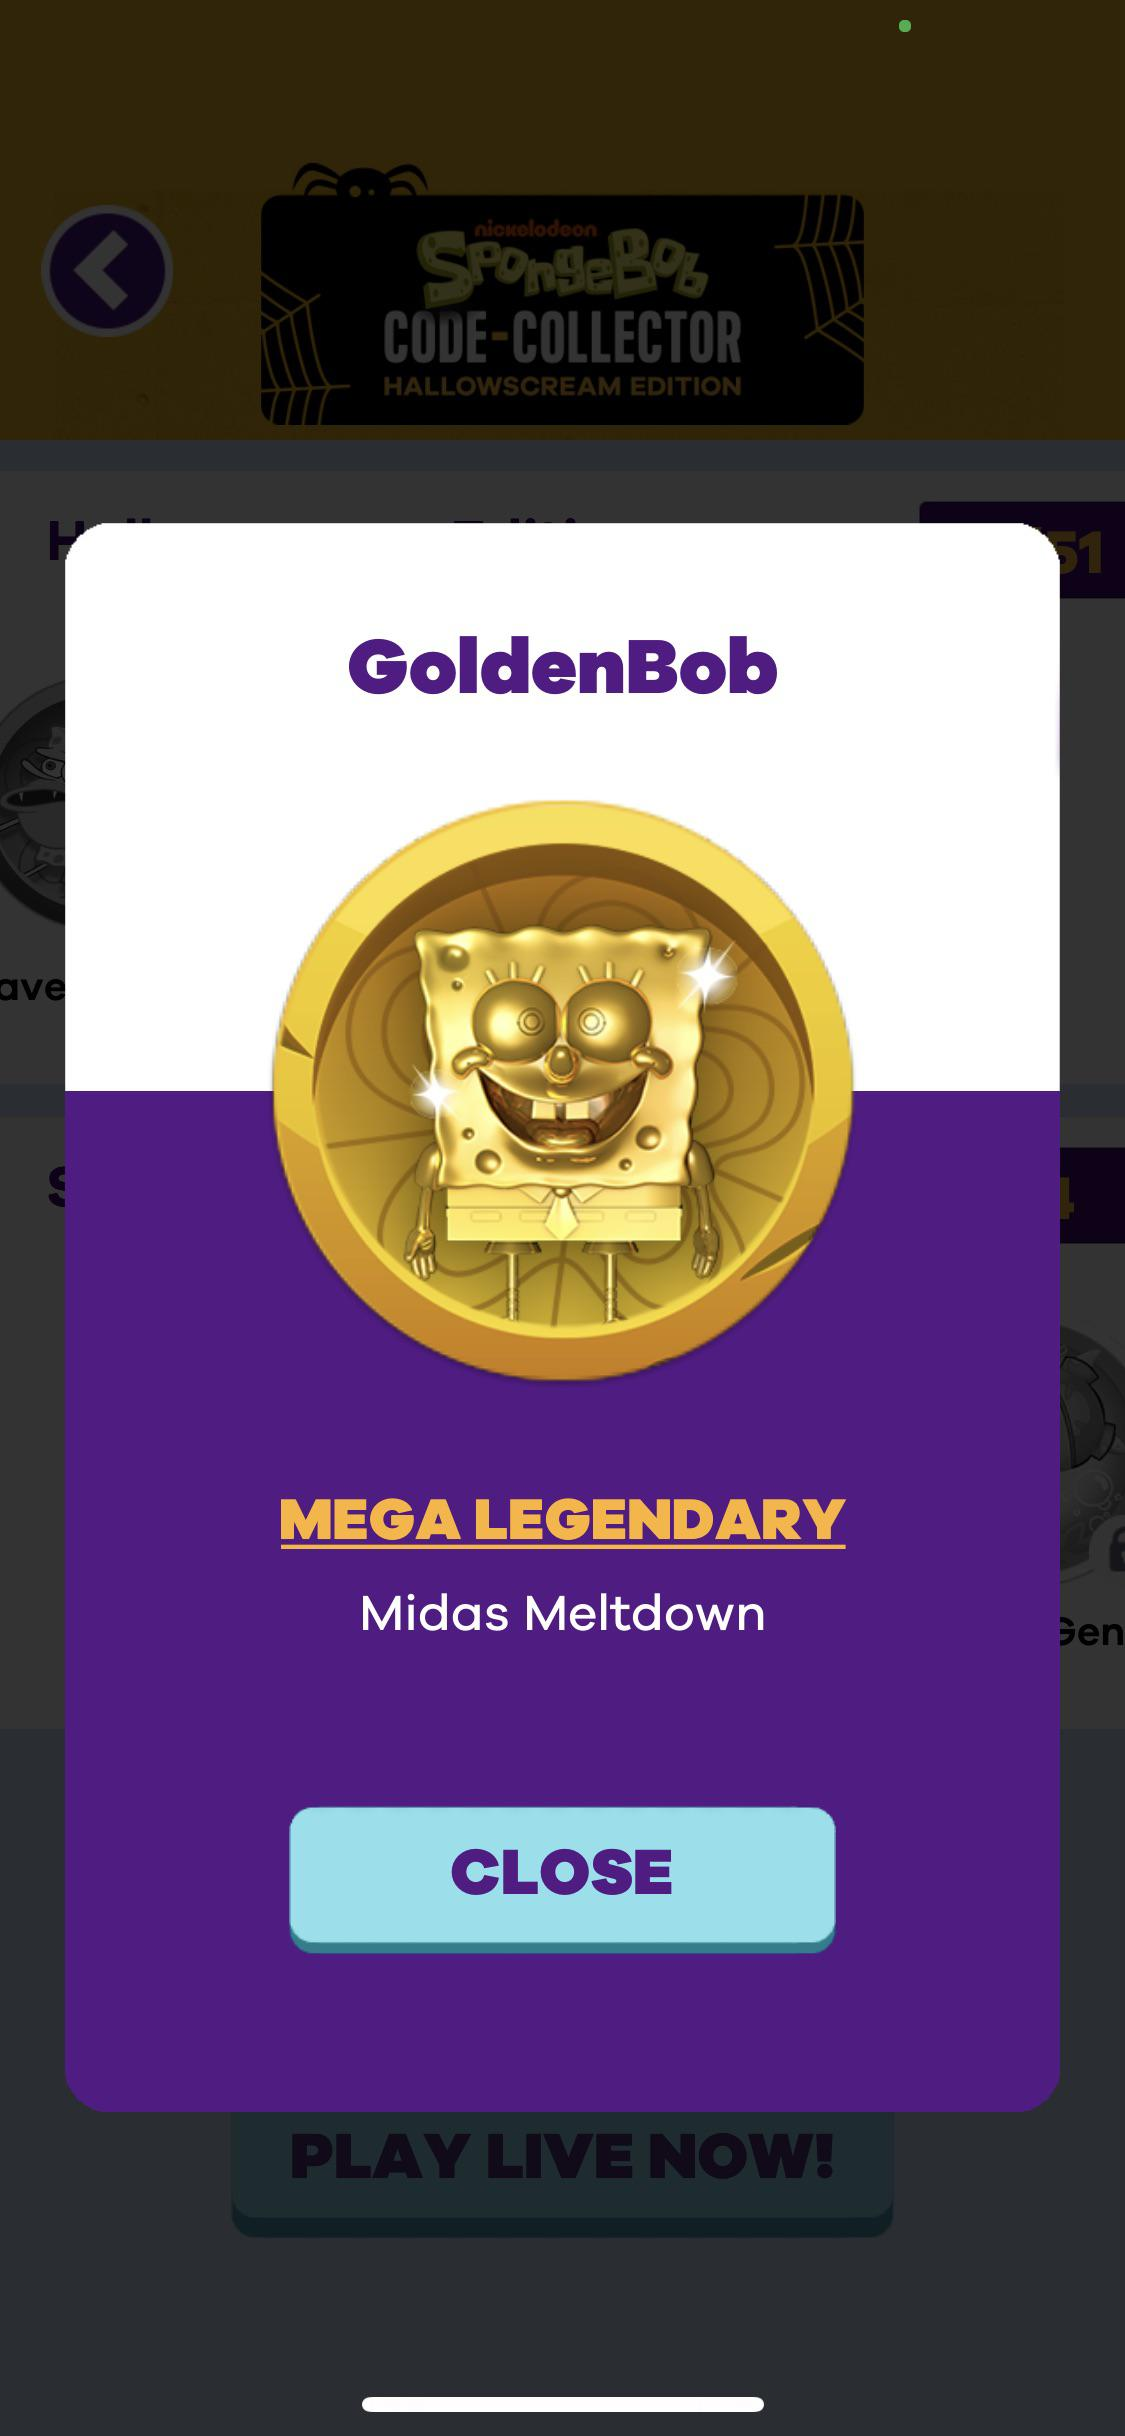 Nickelodeon Code : nickelodeon, Spongebob, Code-Collector, Hallowscream, Edition, Goldenbob